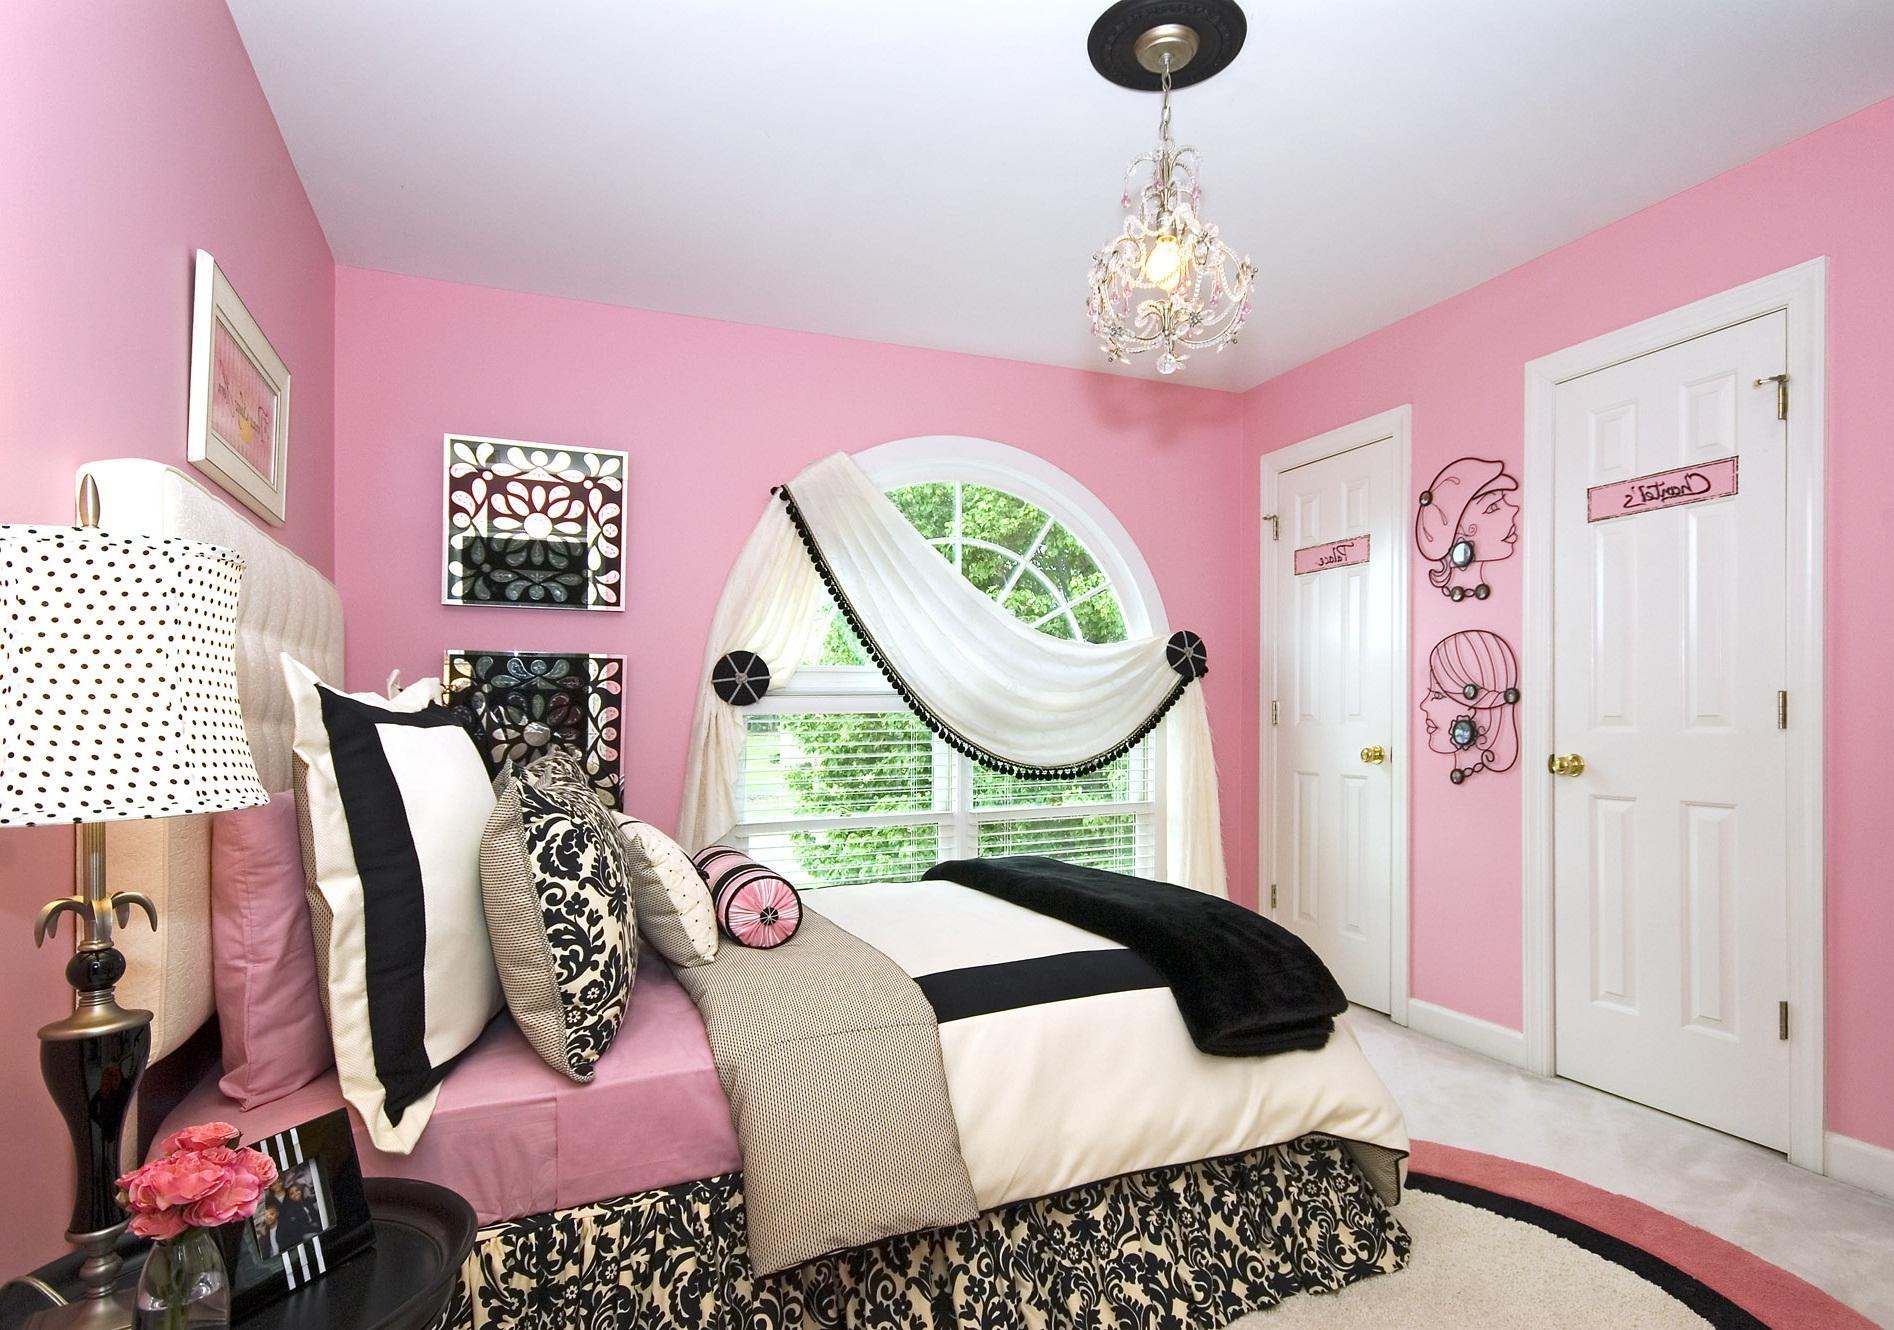 Bedroom Teen Room Decor Decorating Ideas Girl Diy Girls Rooms With Teenage Wall Art (Image 5 of 20)